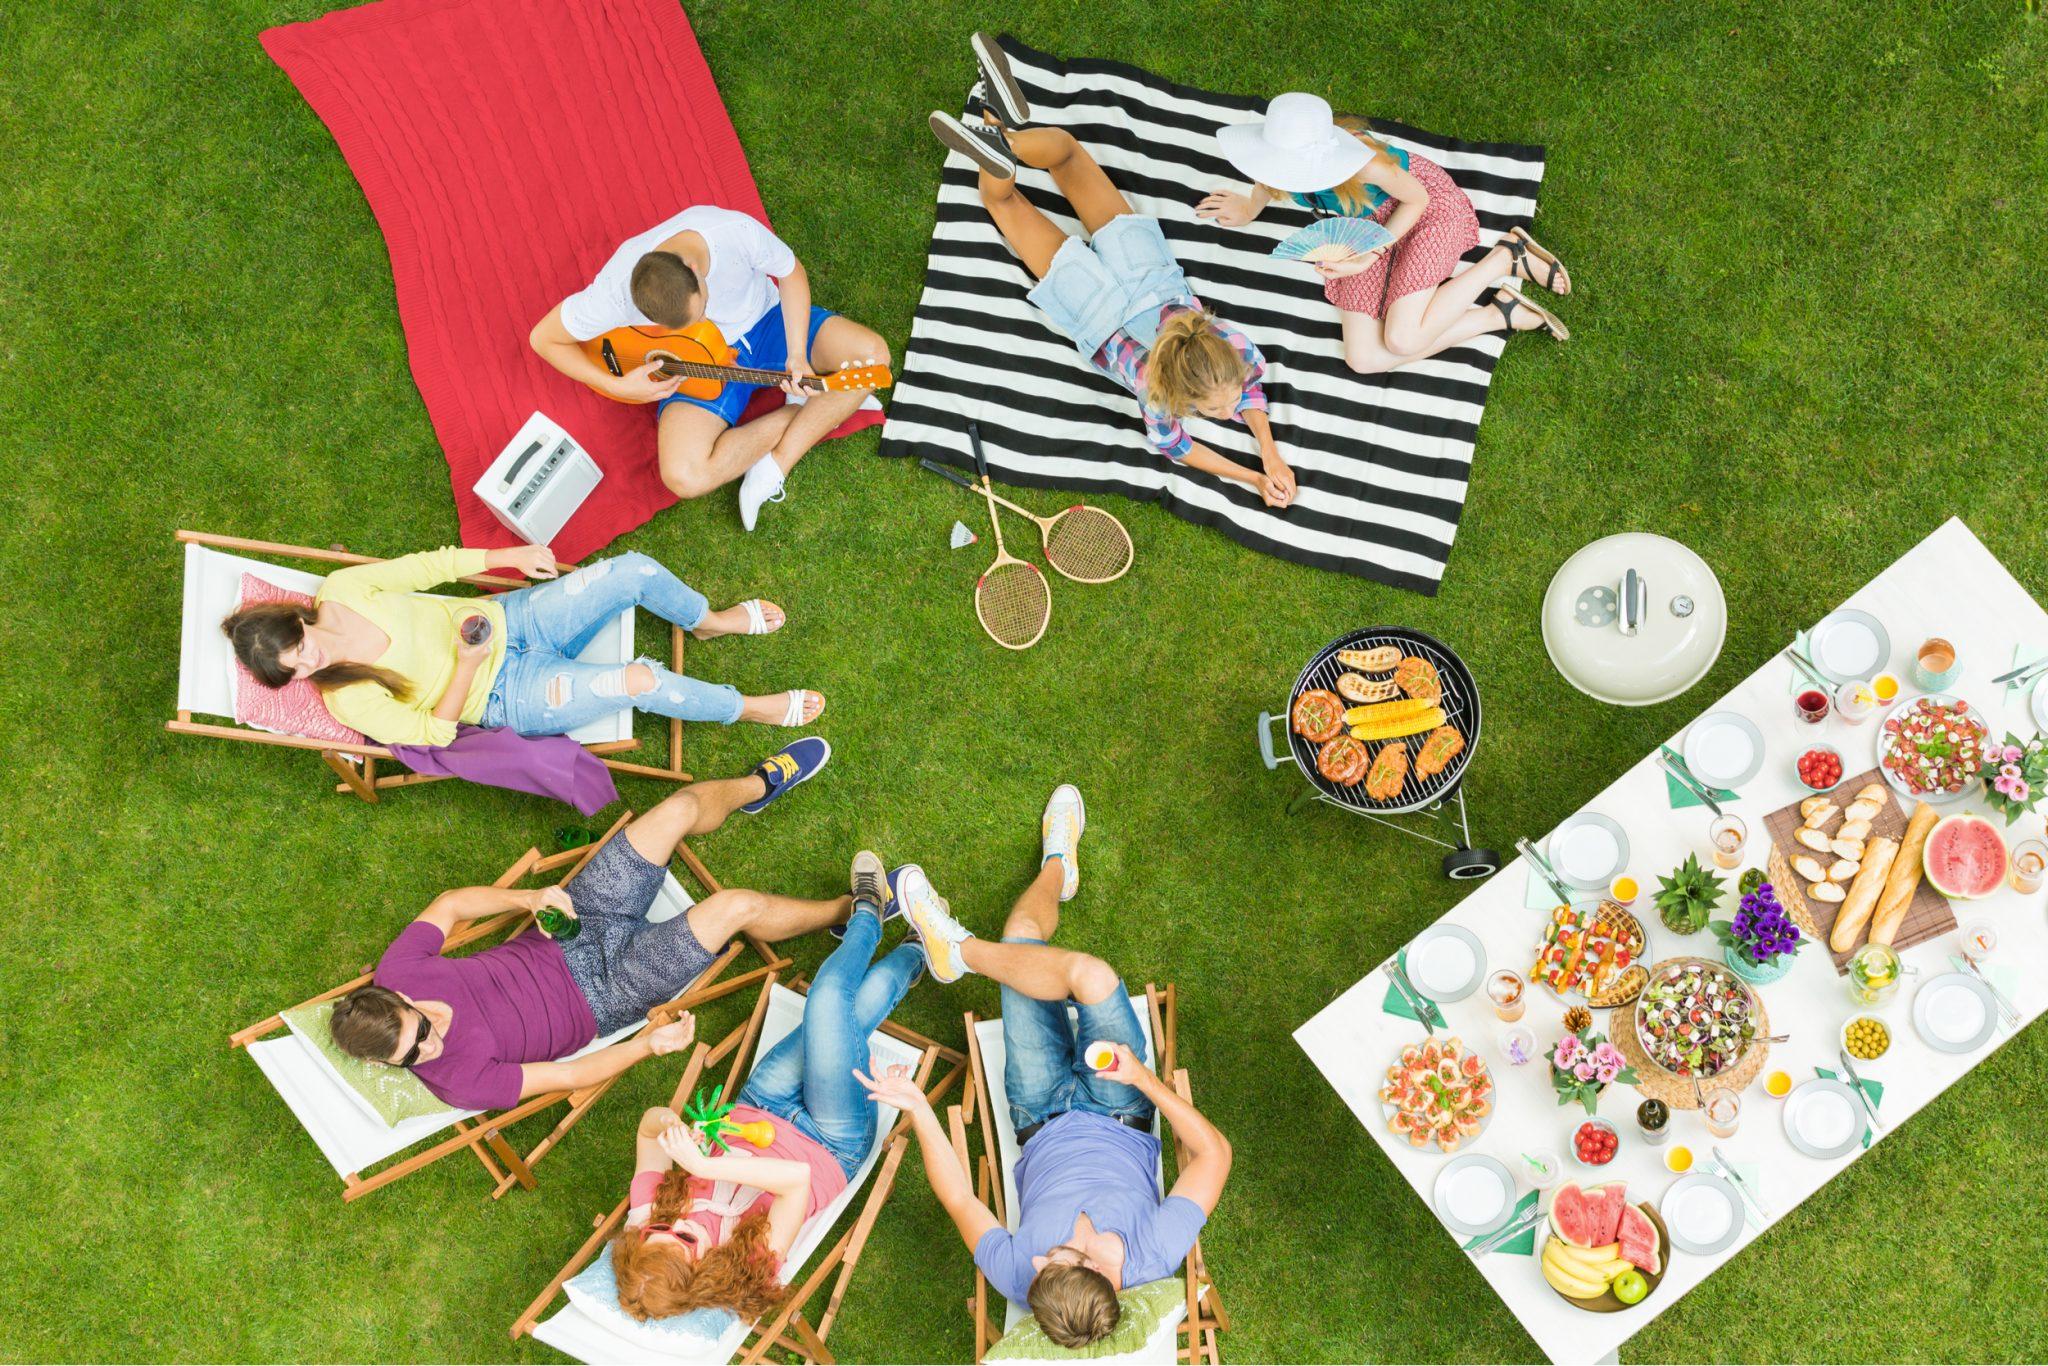 Backyard Camping Ideas